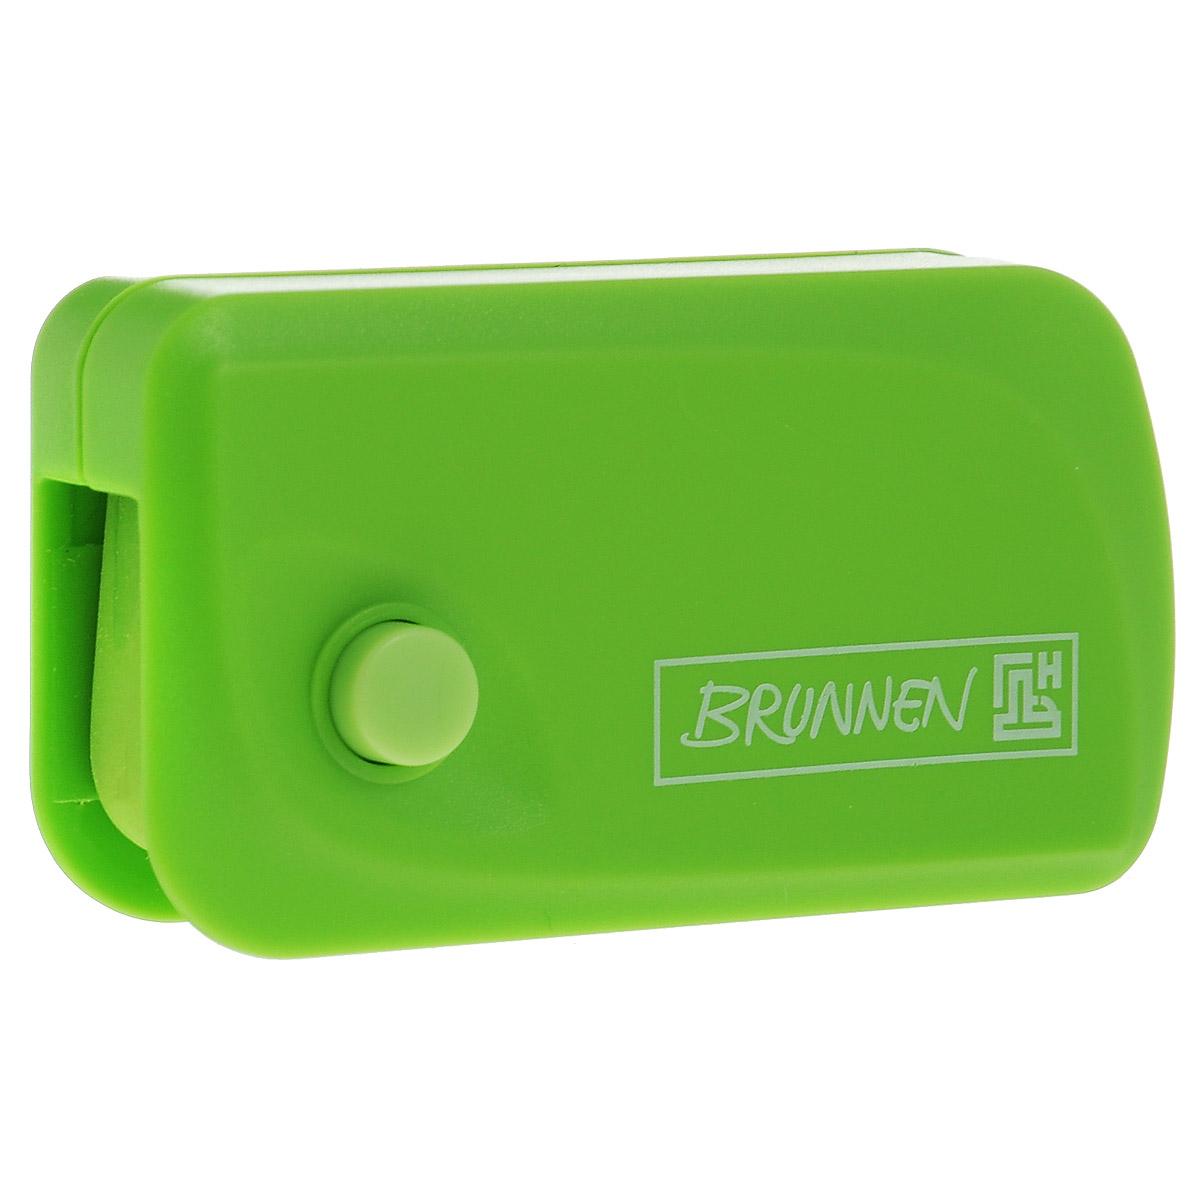 "Brunnen Ластик ""Клик"", цвет: зеленый"